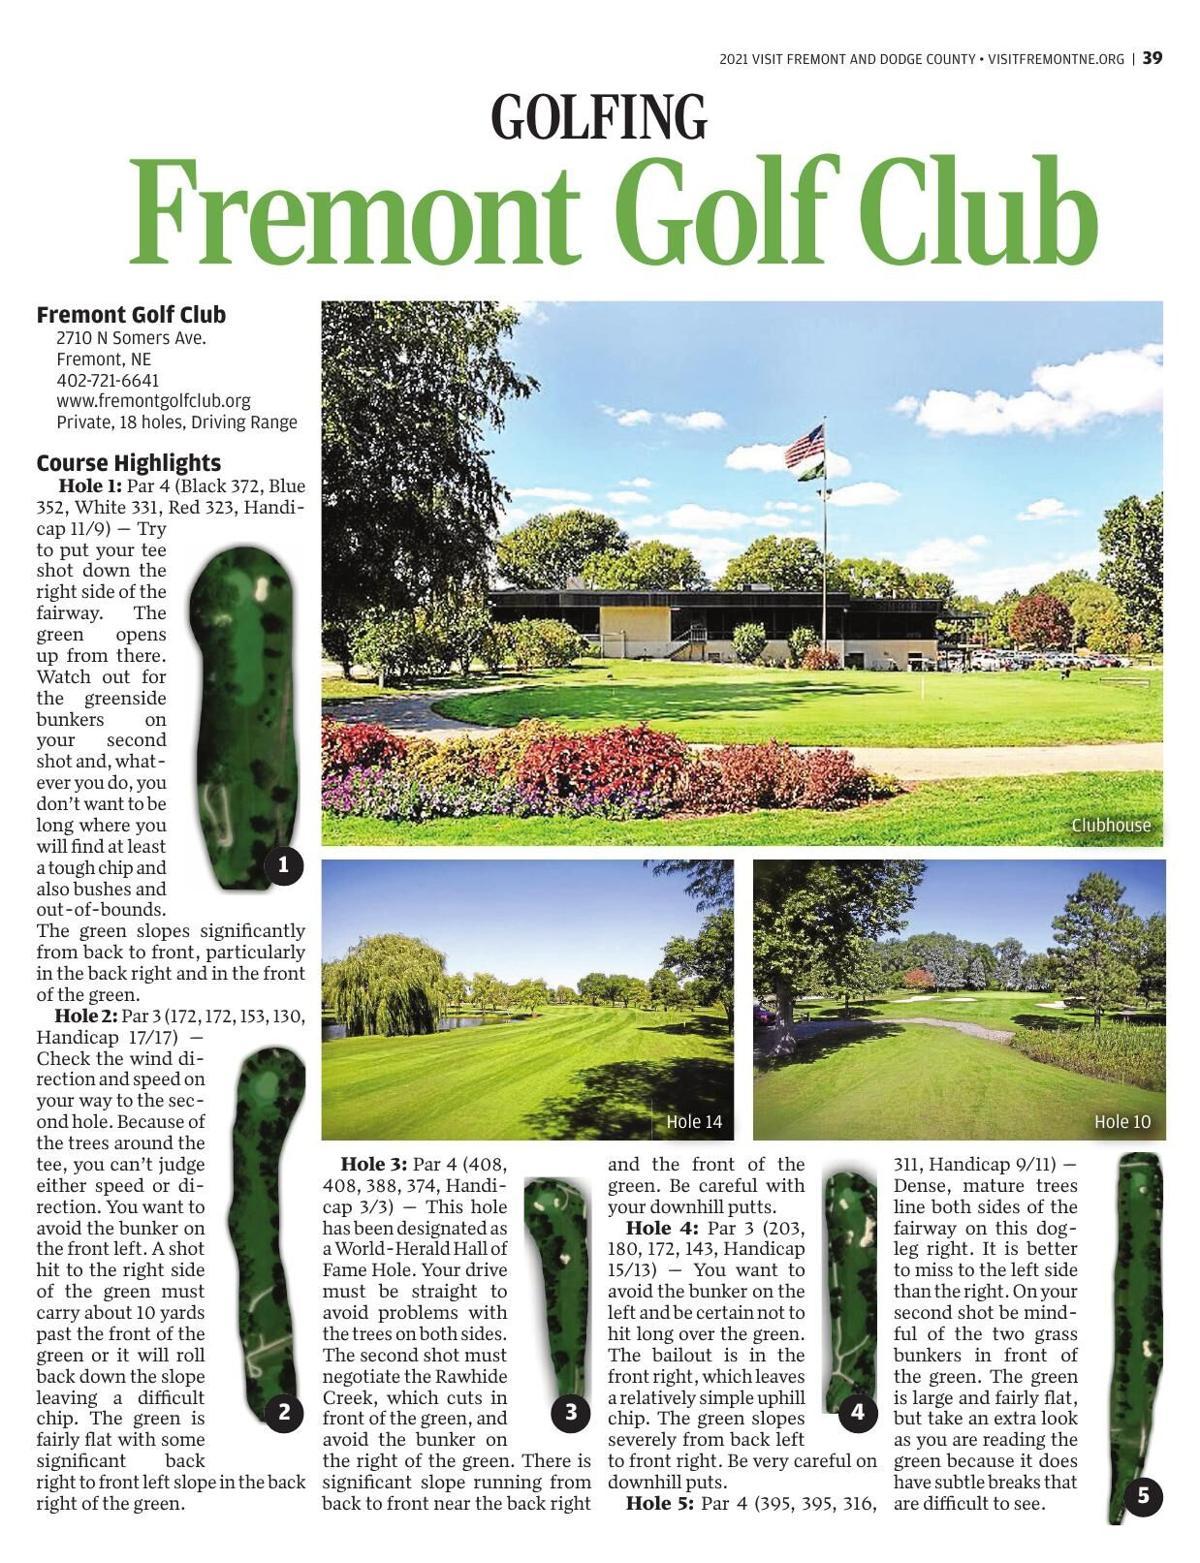 Visit Fremont and Dodge County 2021 39.pdf